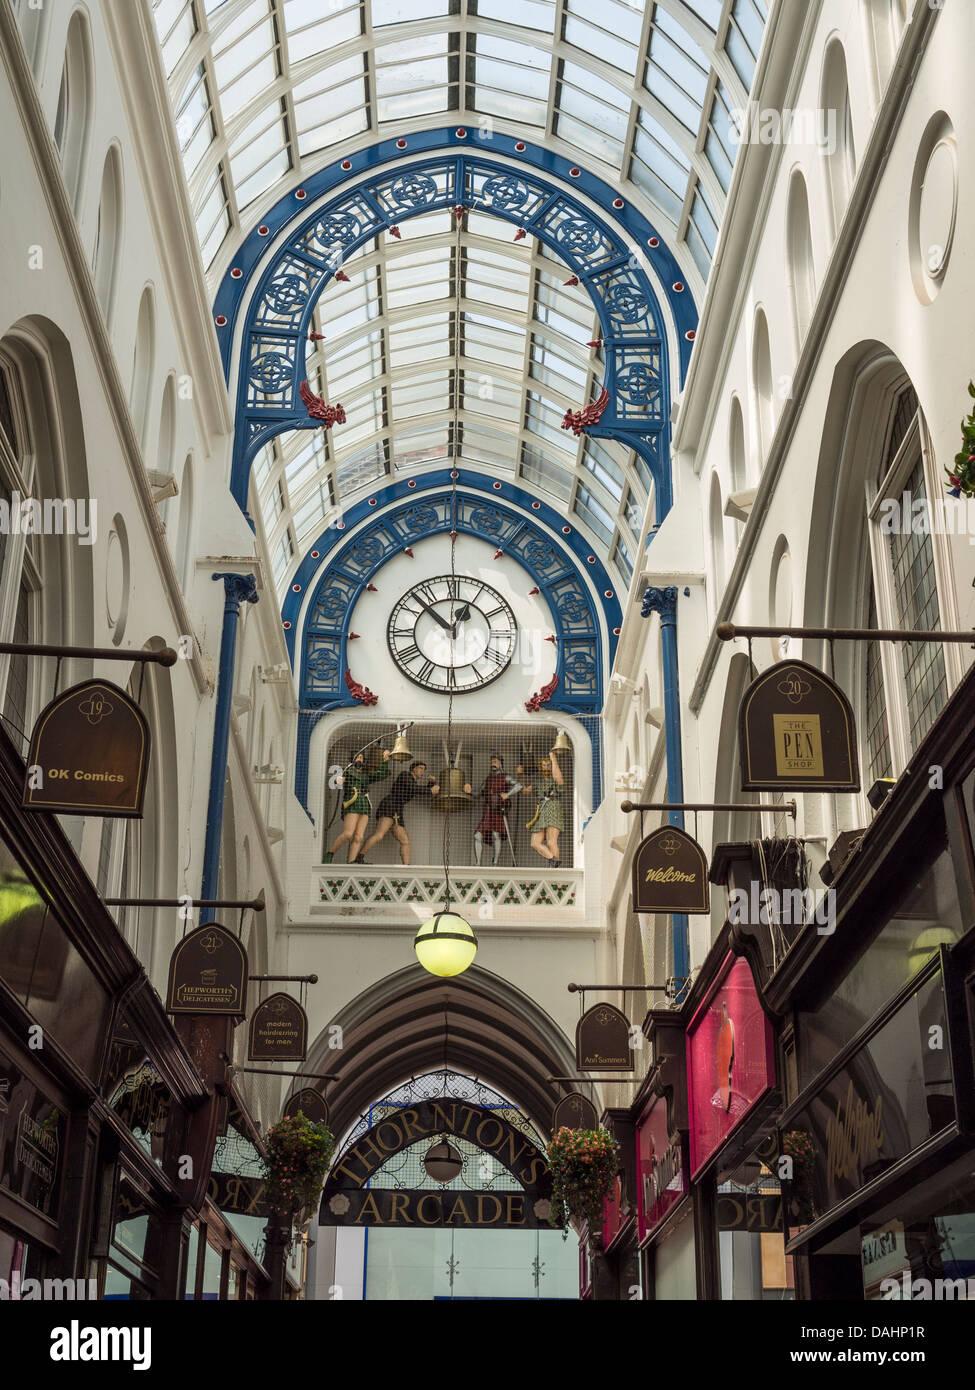 Leeds, UK. Clock in Thorntons Arcade. - Stock Image